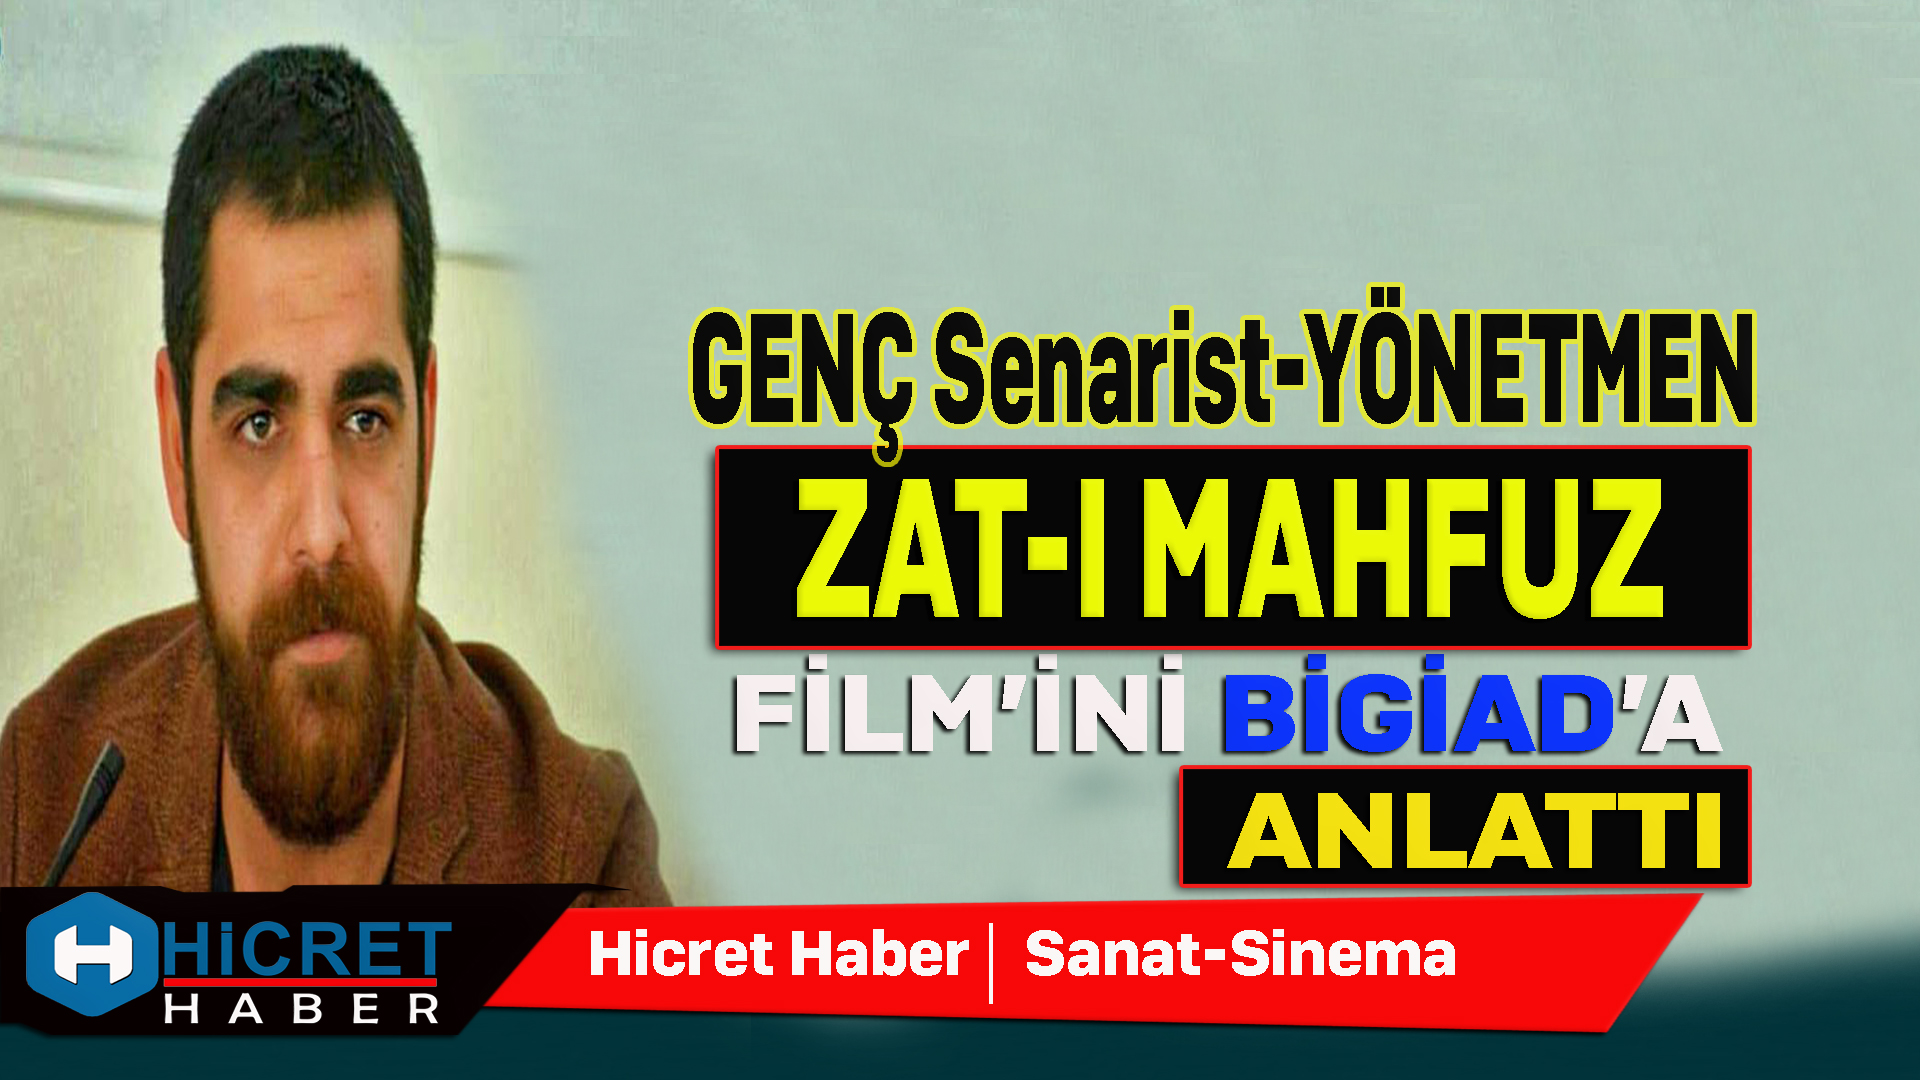 Zat-ı Mahfuz'un Genç Yönetmeni Bigiad'ı Ziyaret Etti